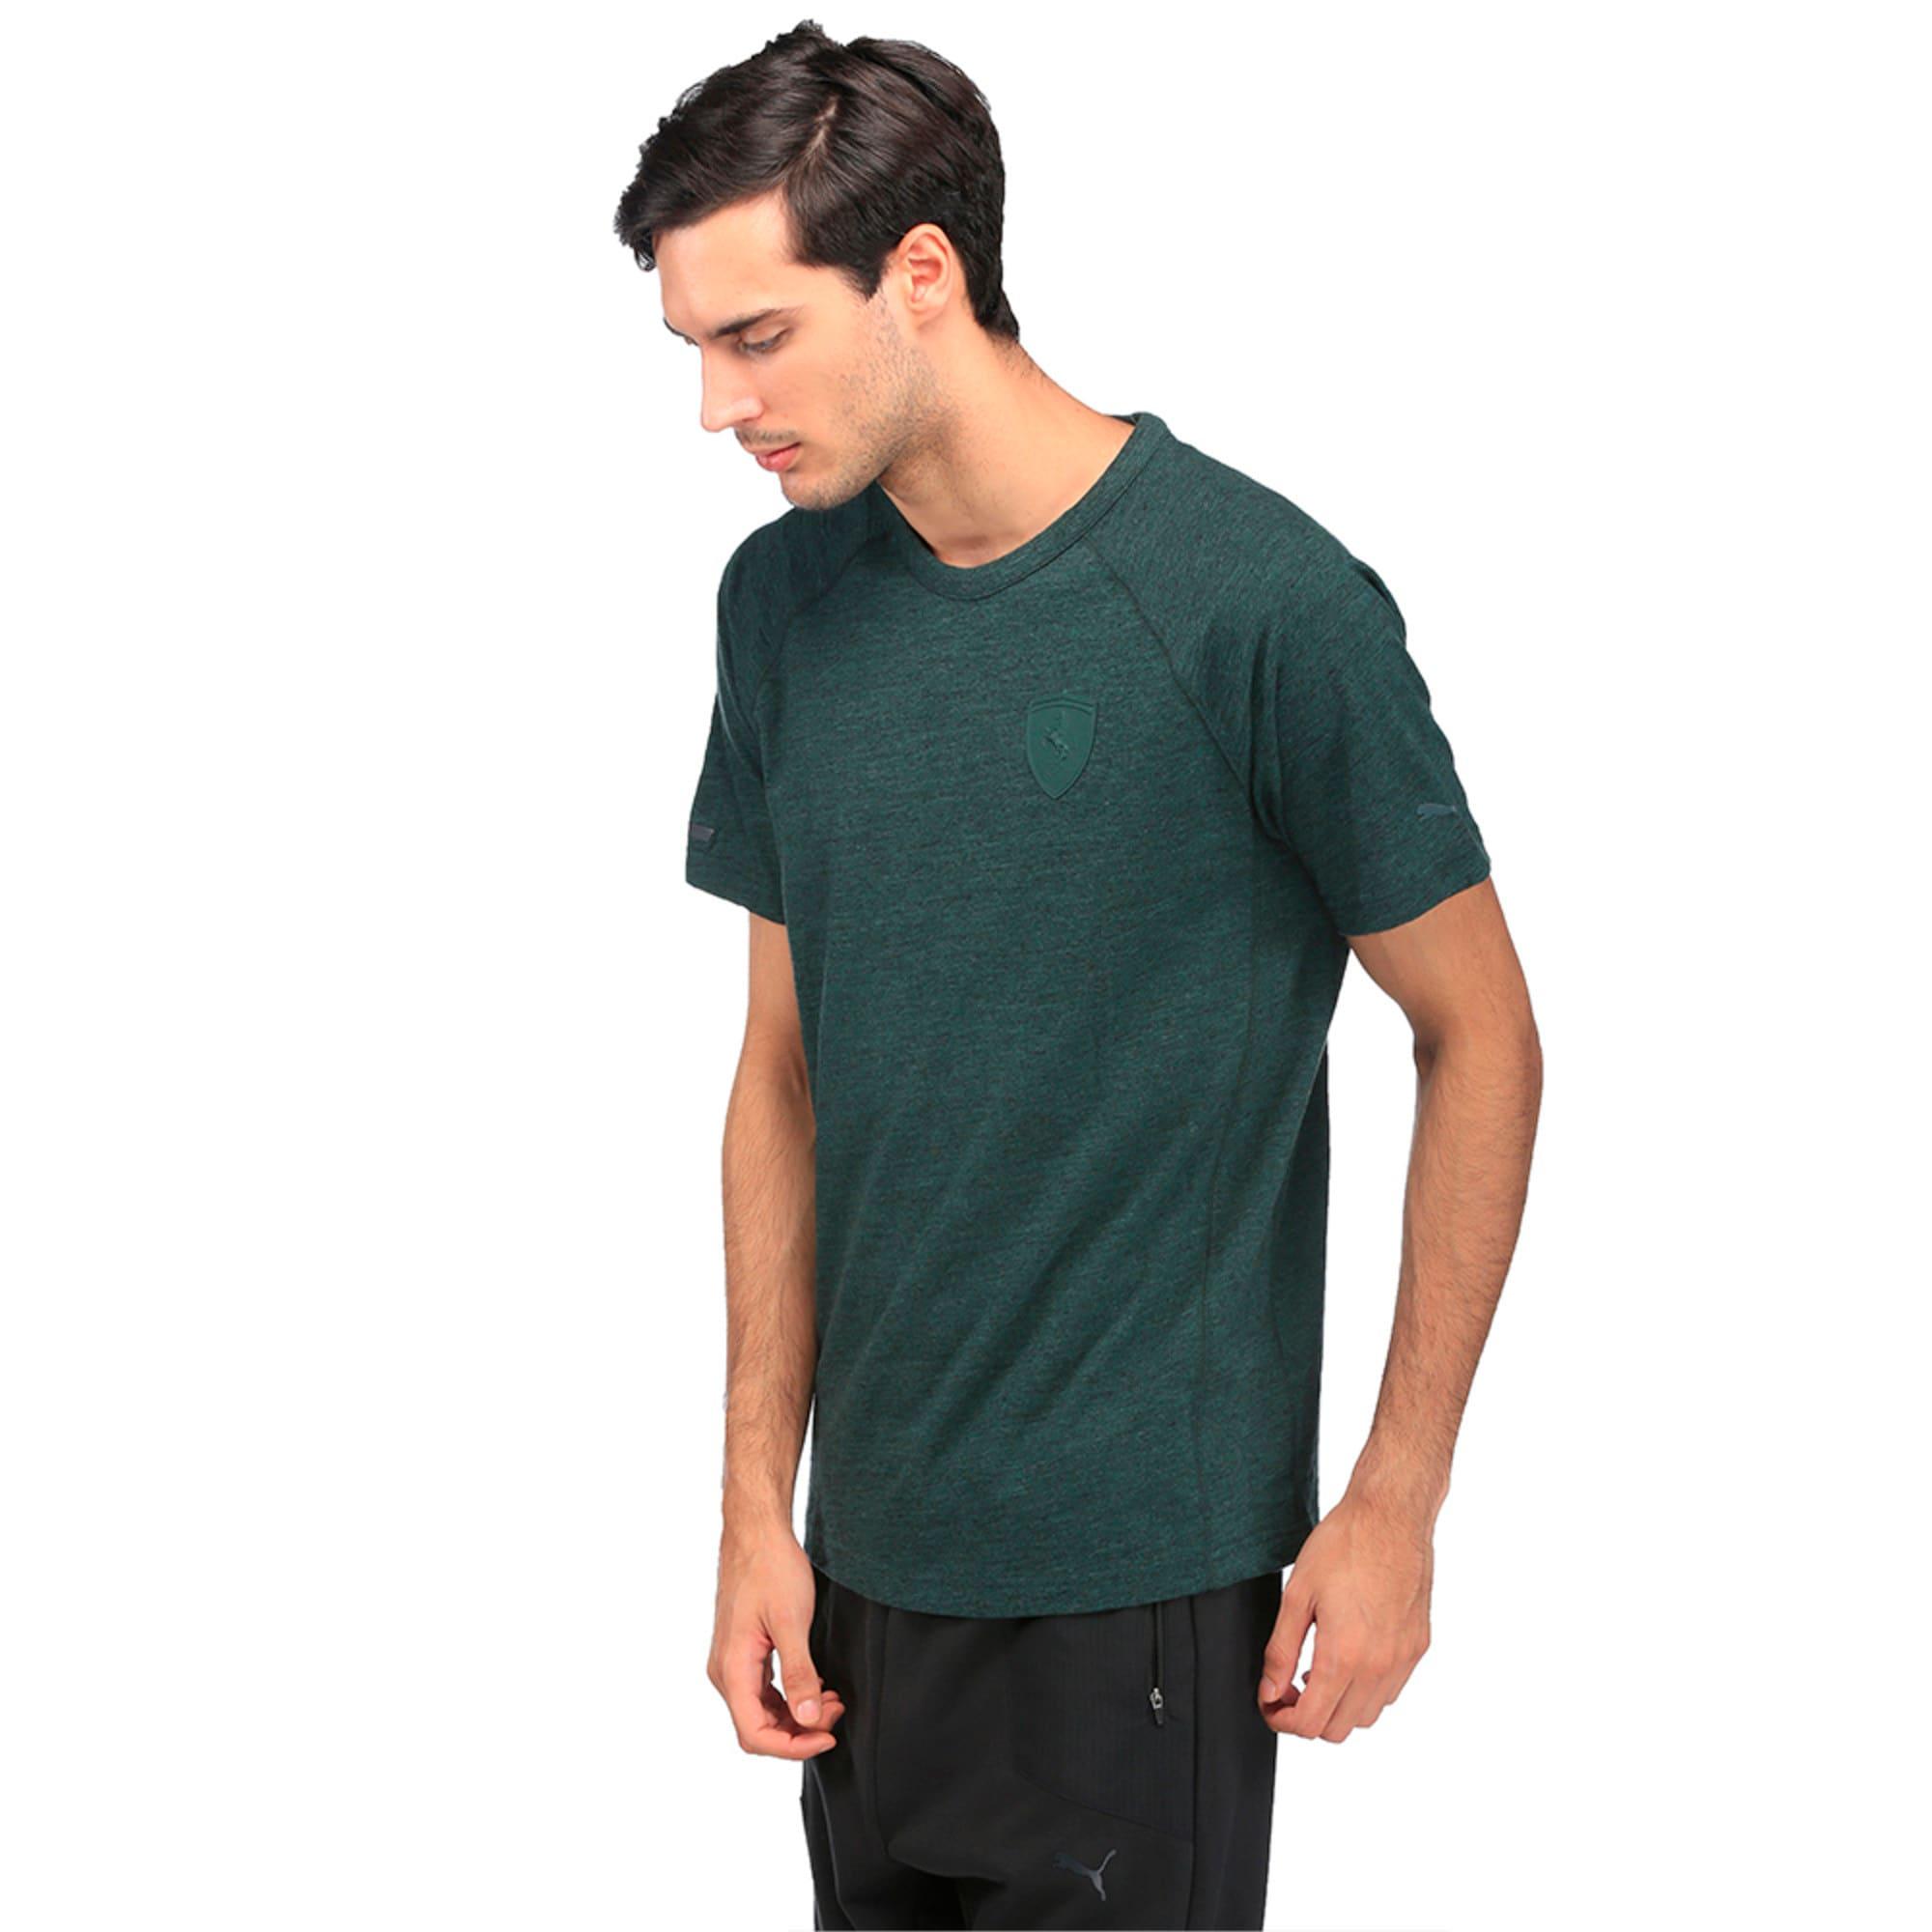 Thumbnail 3 of Ferrari Lifestyle Men's Small Shield T-Shirt, Green Gables Heather, medium-IND